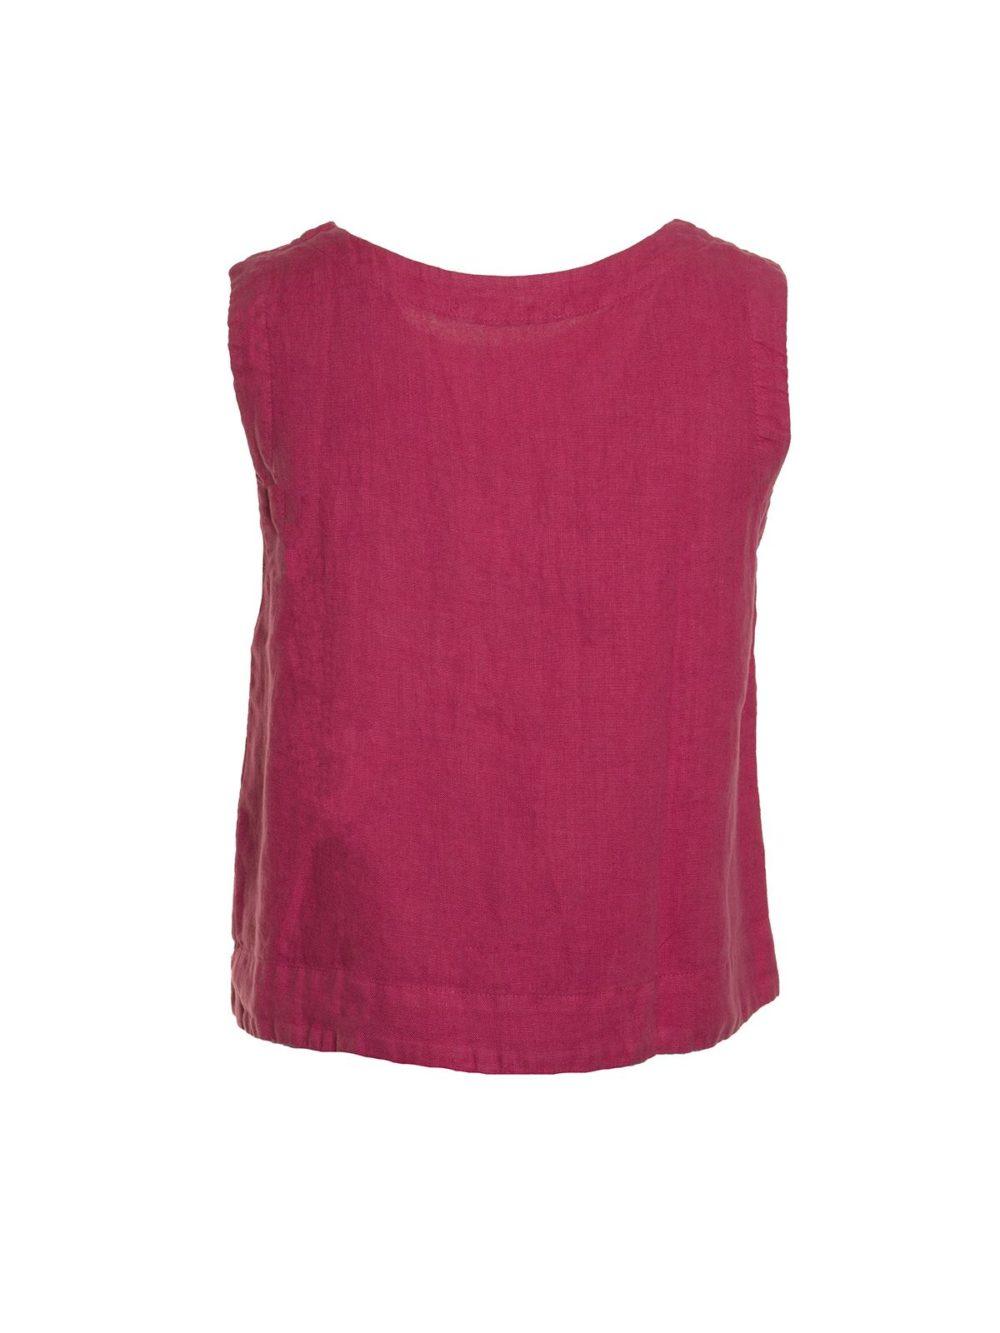 4405331 Shell Wide Top Cut Loose Katie Kerr Women's Clothing